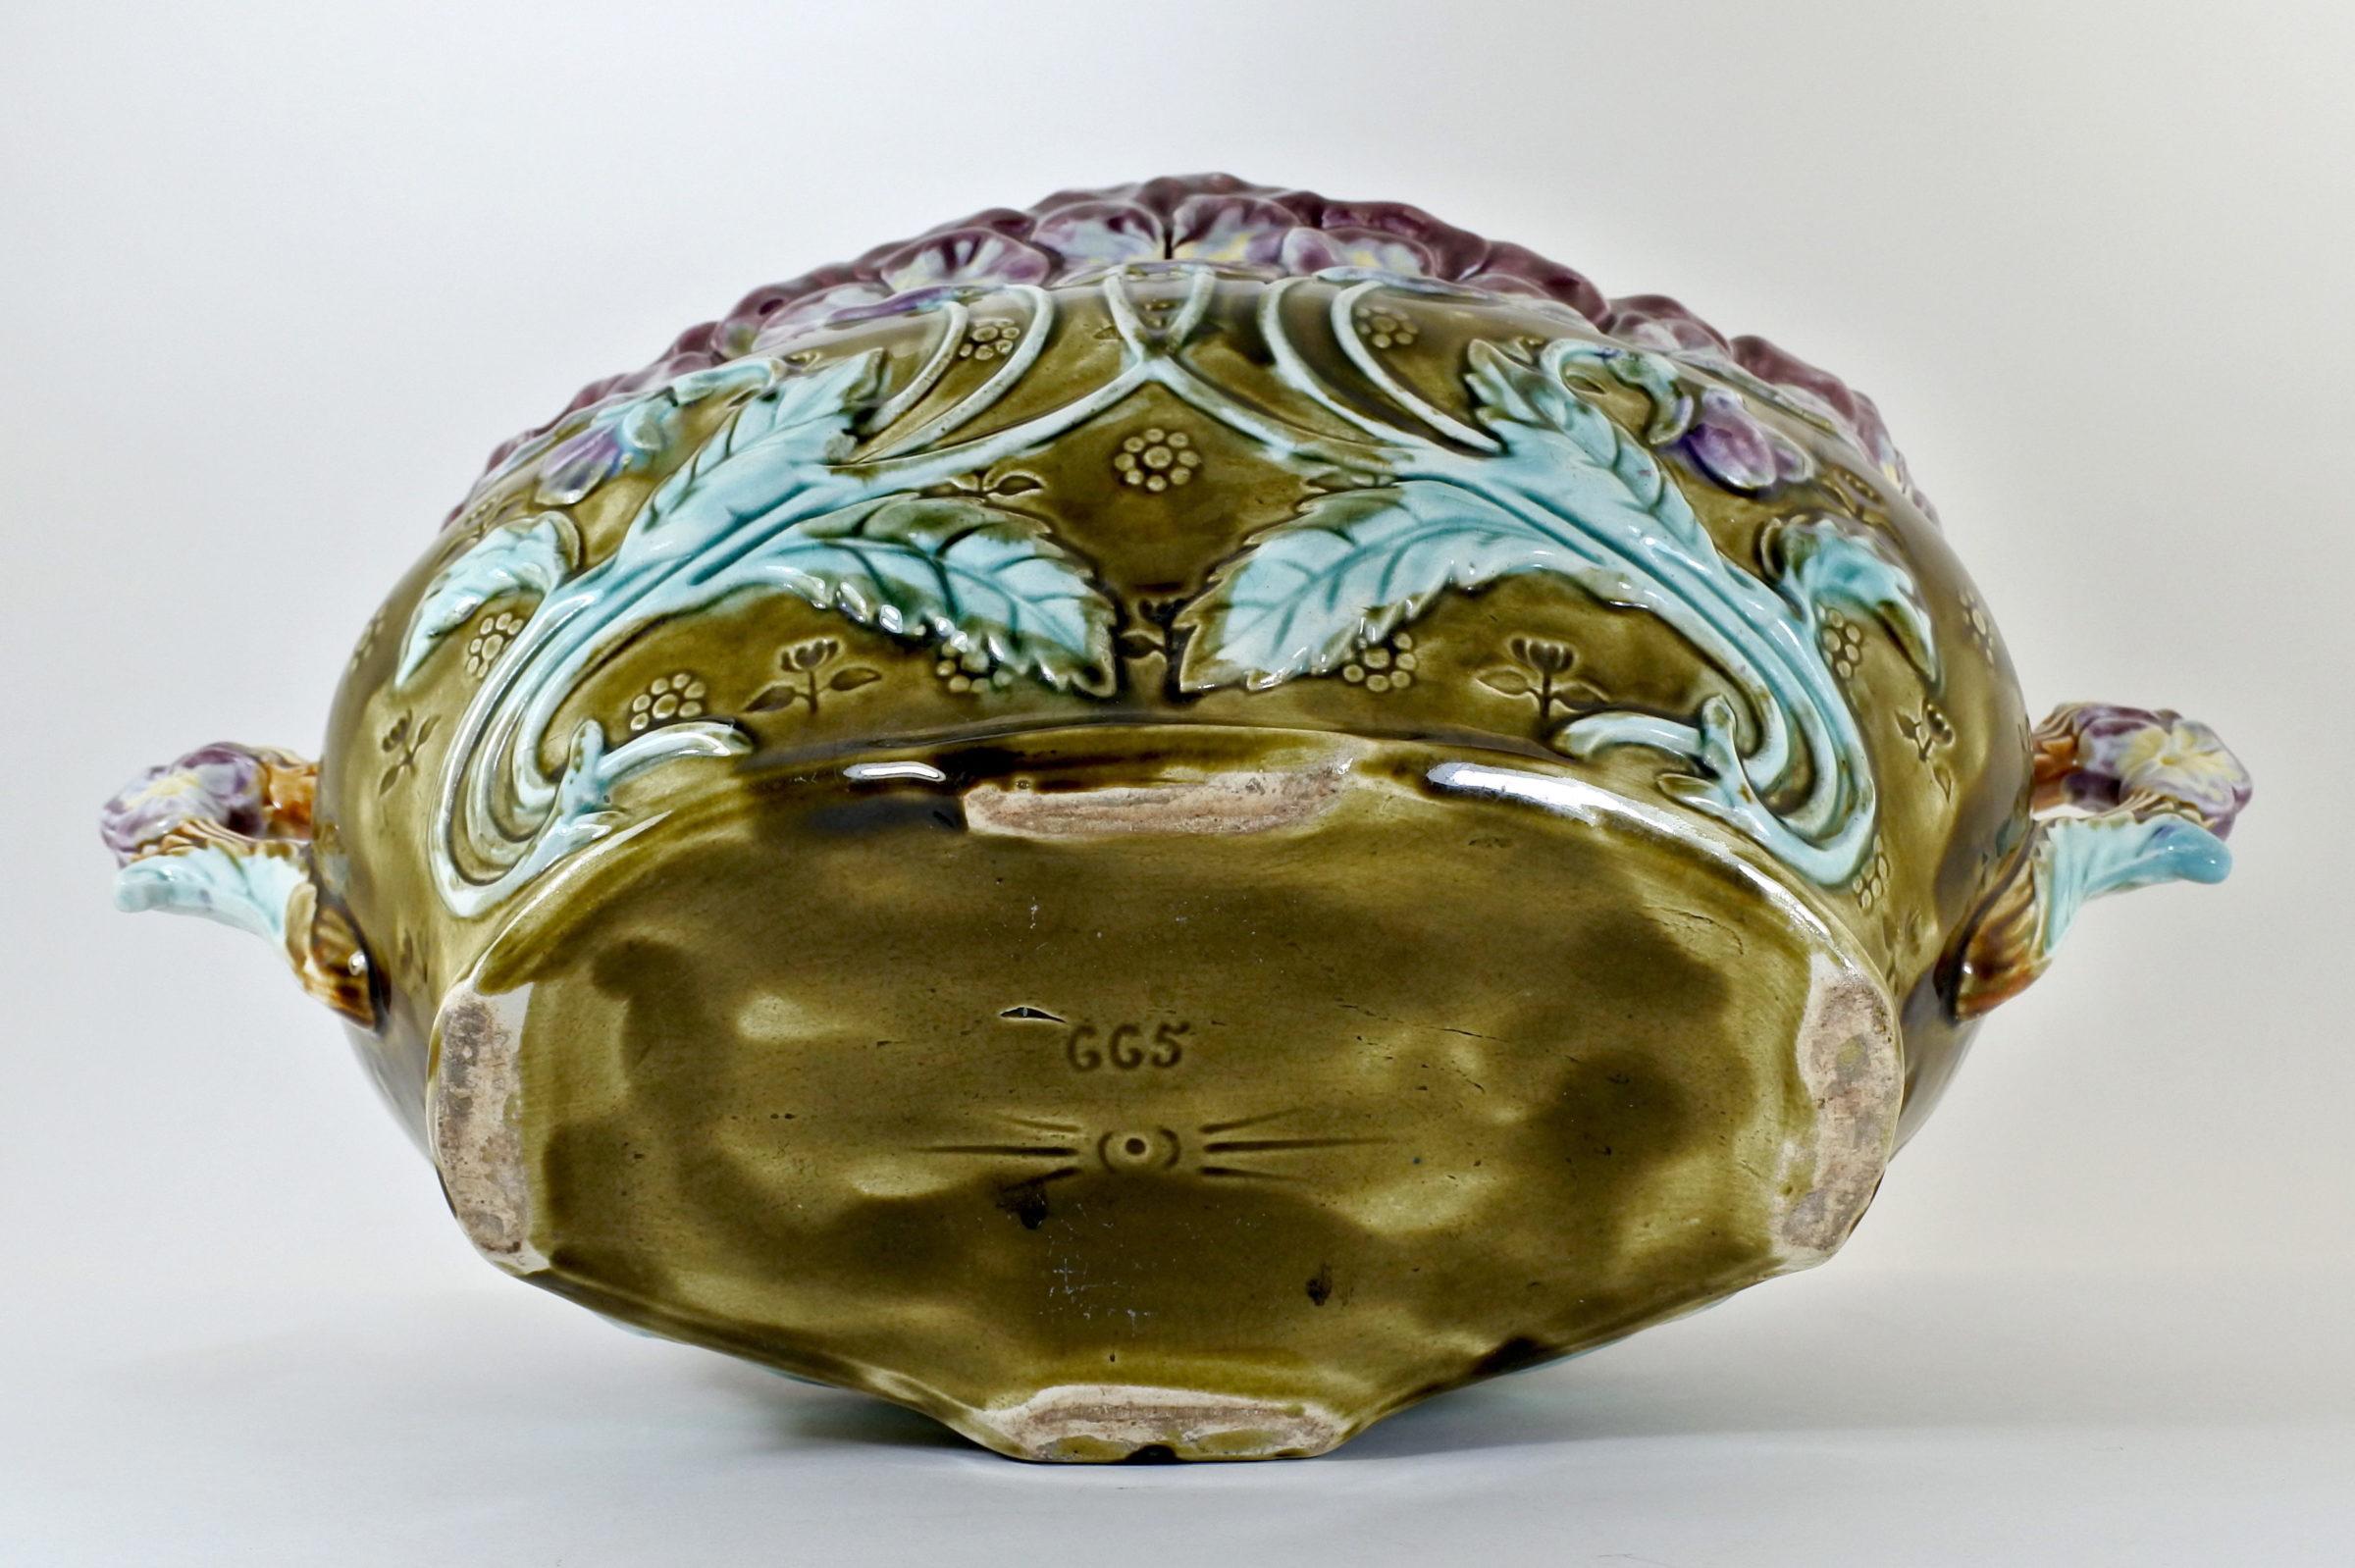 Jardinière in ceramica barbotine con viole del pensiero - Pensées - 2